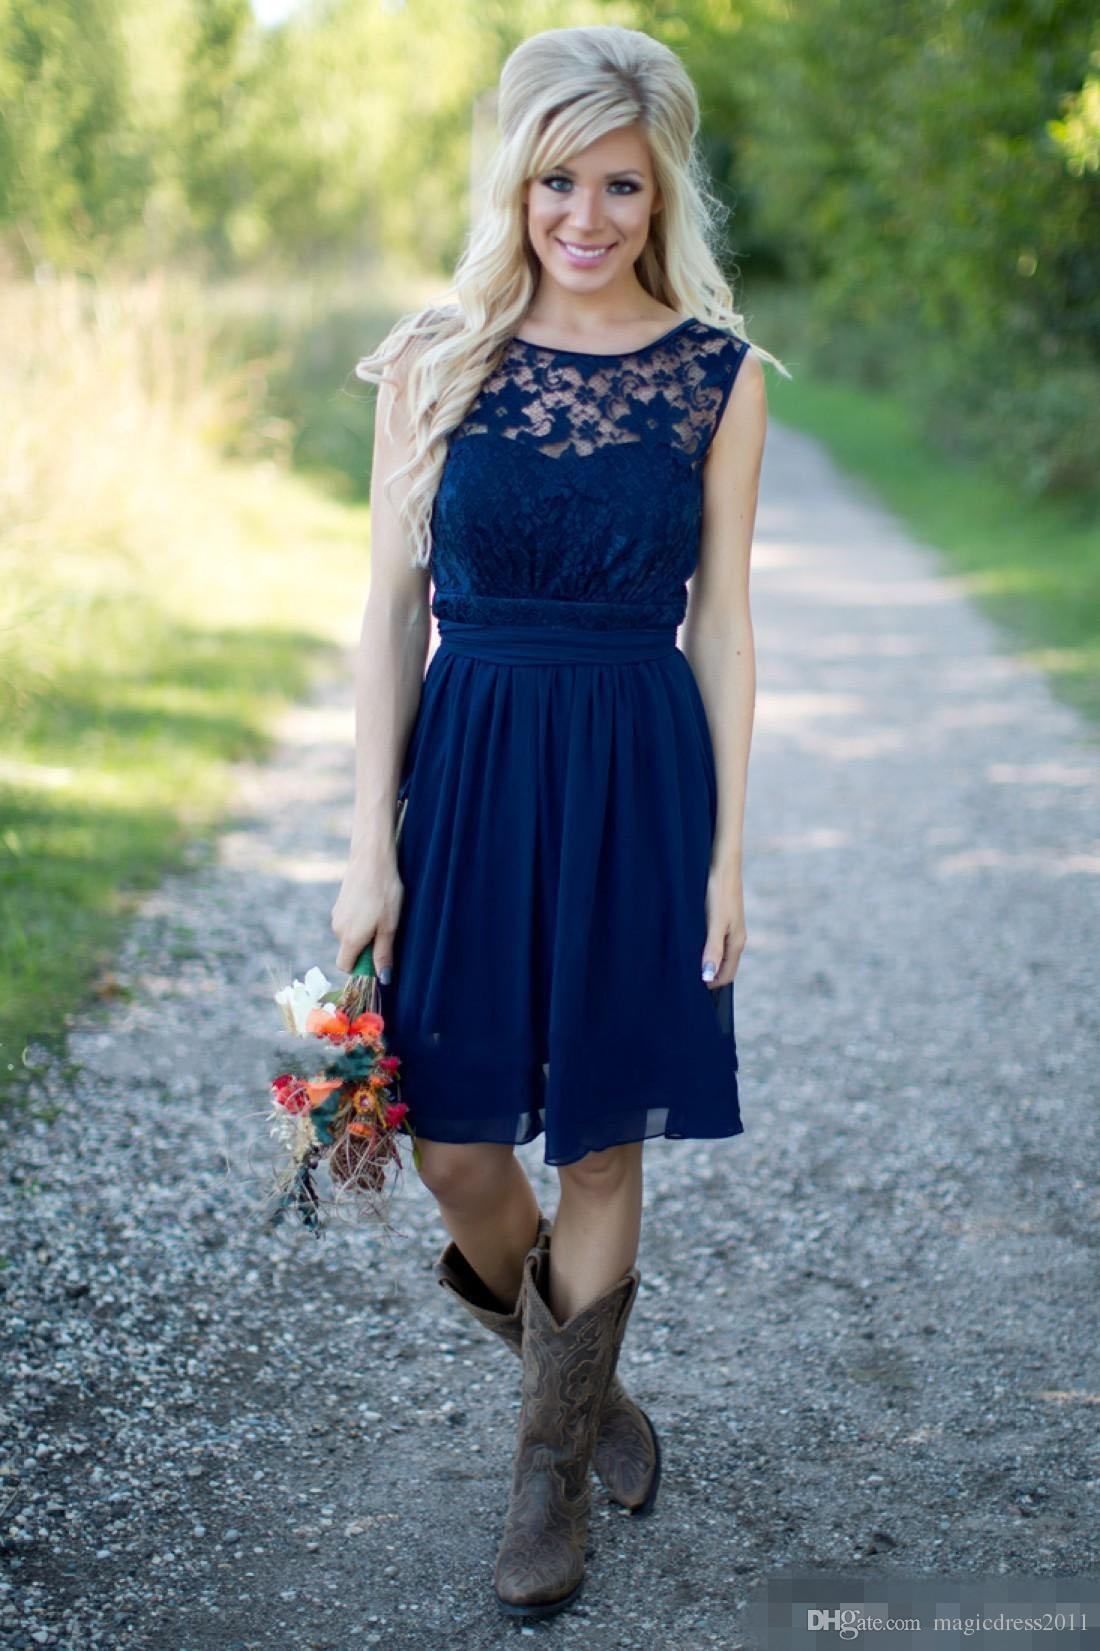 Cheap country style 2016 newest royal blue chiffon and lace short country style 2016 newest royal blue chiffon and lace short bridesmaid dresses for weddings cheap jewel ombrellifo Choice Image